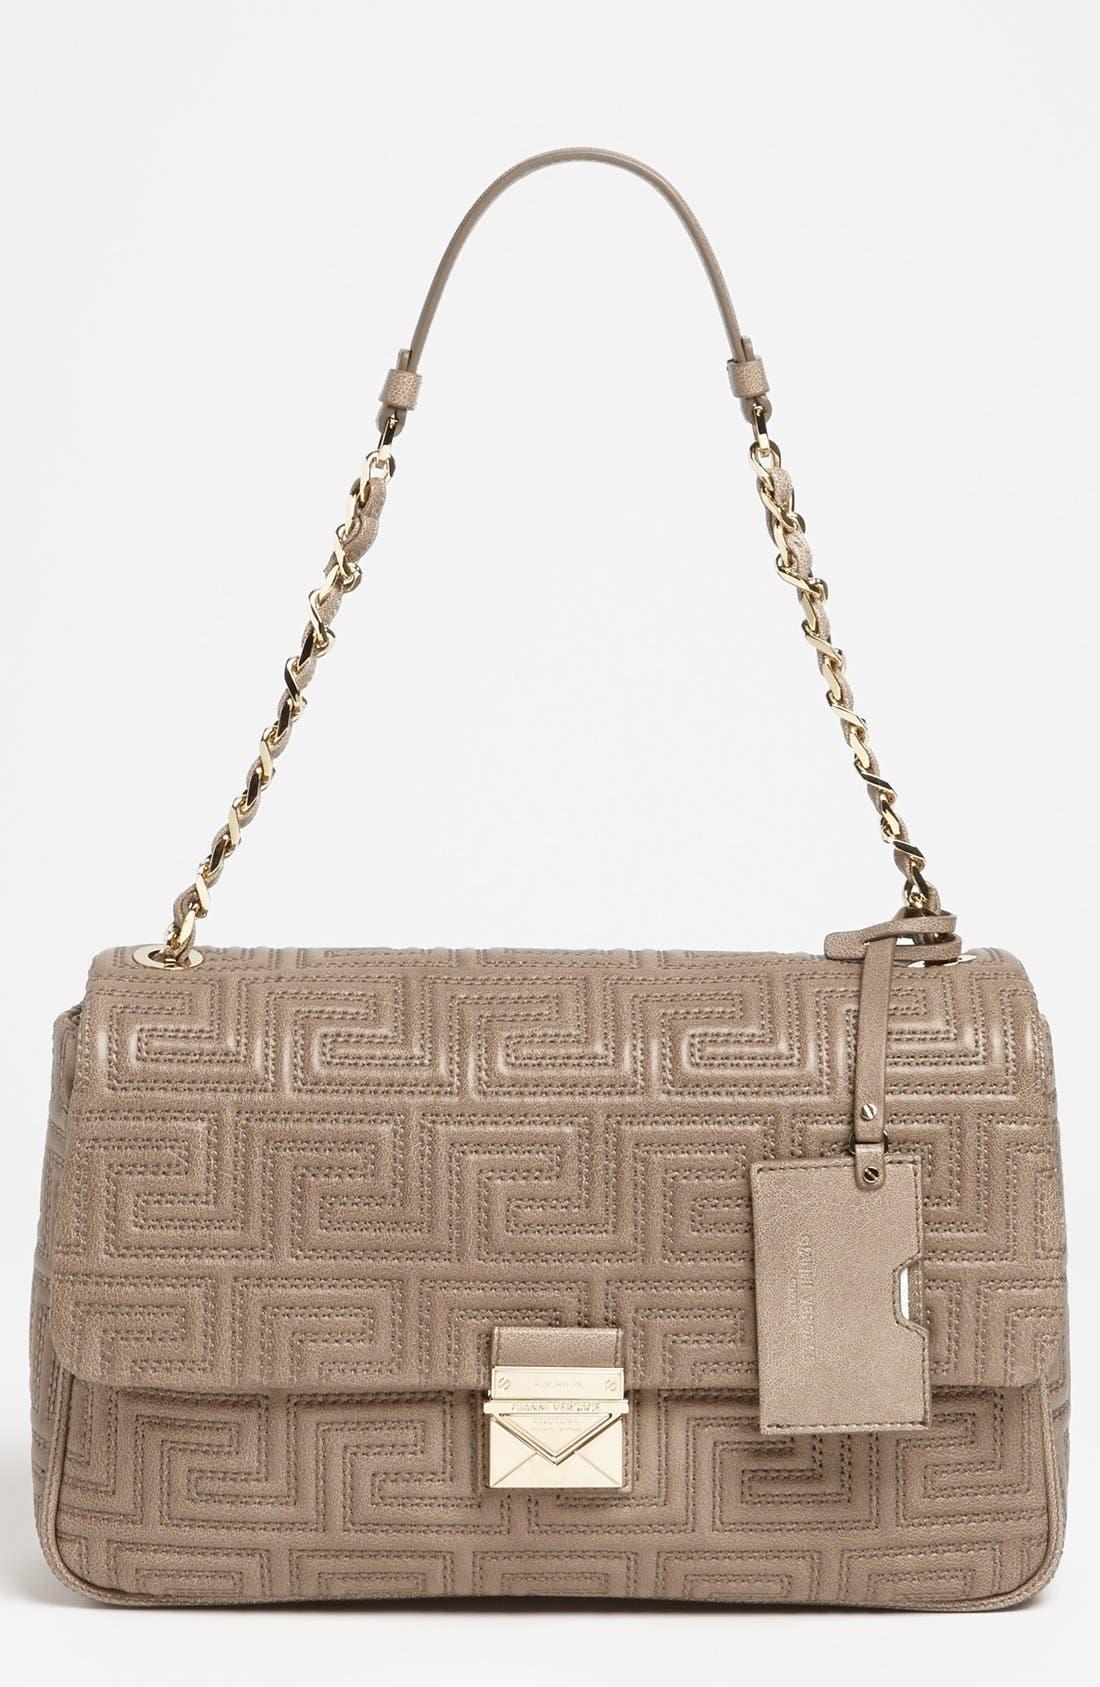 Main Image - Versace 'Couture' Leather Flap Shoulder Bag